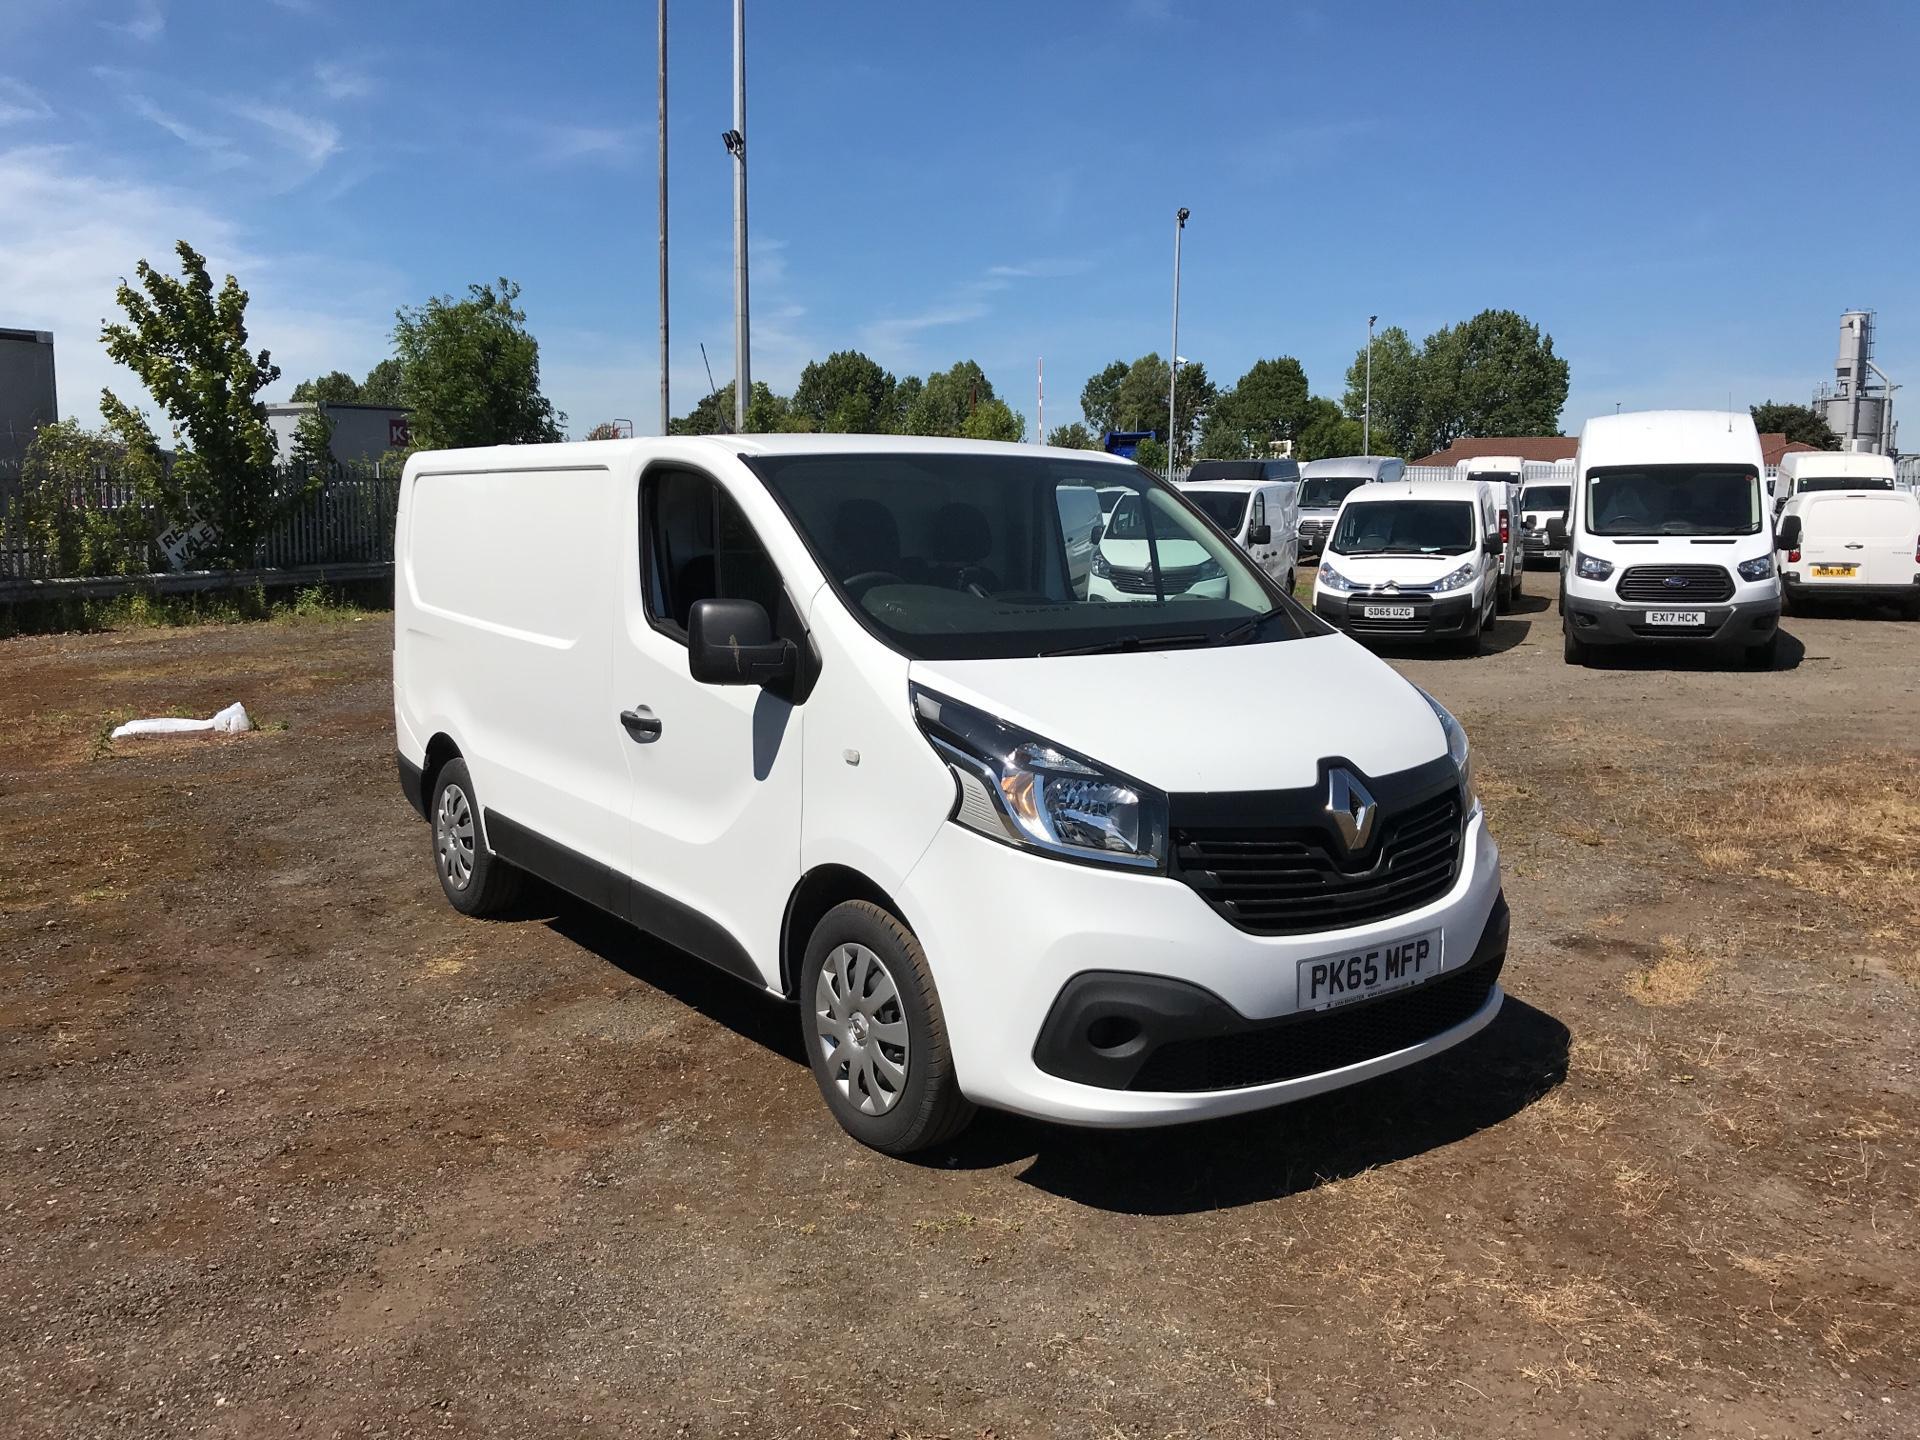 2015 Renault Trafic Sl27dci 115 Business+ Van EURO 5 (PK65MFP)